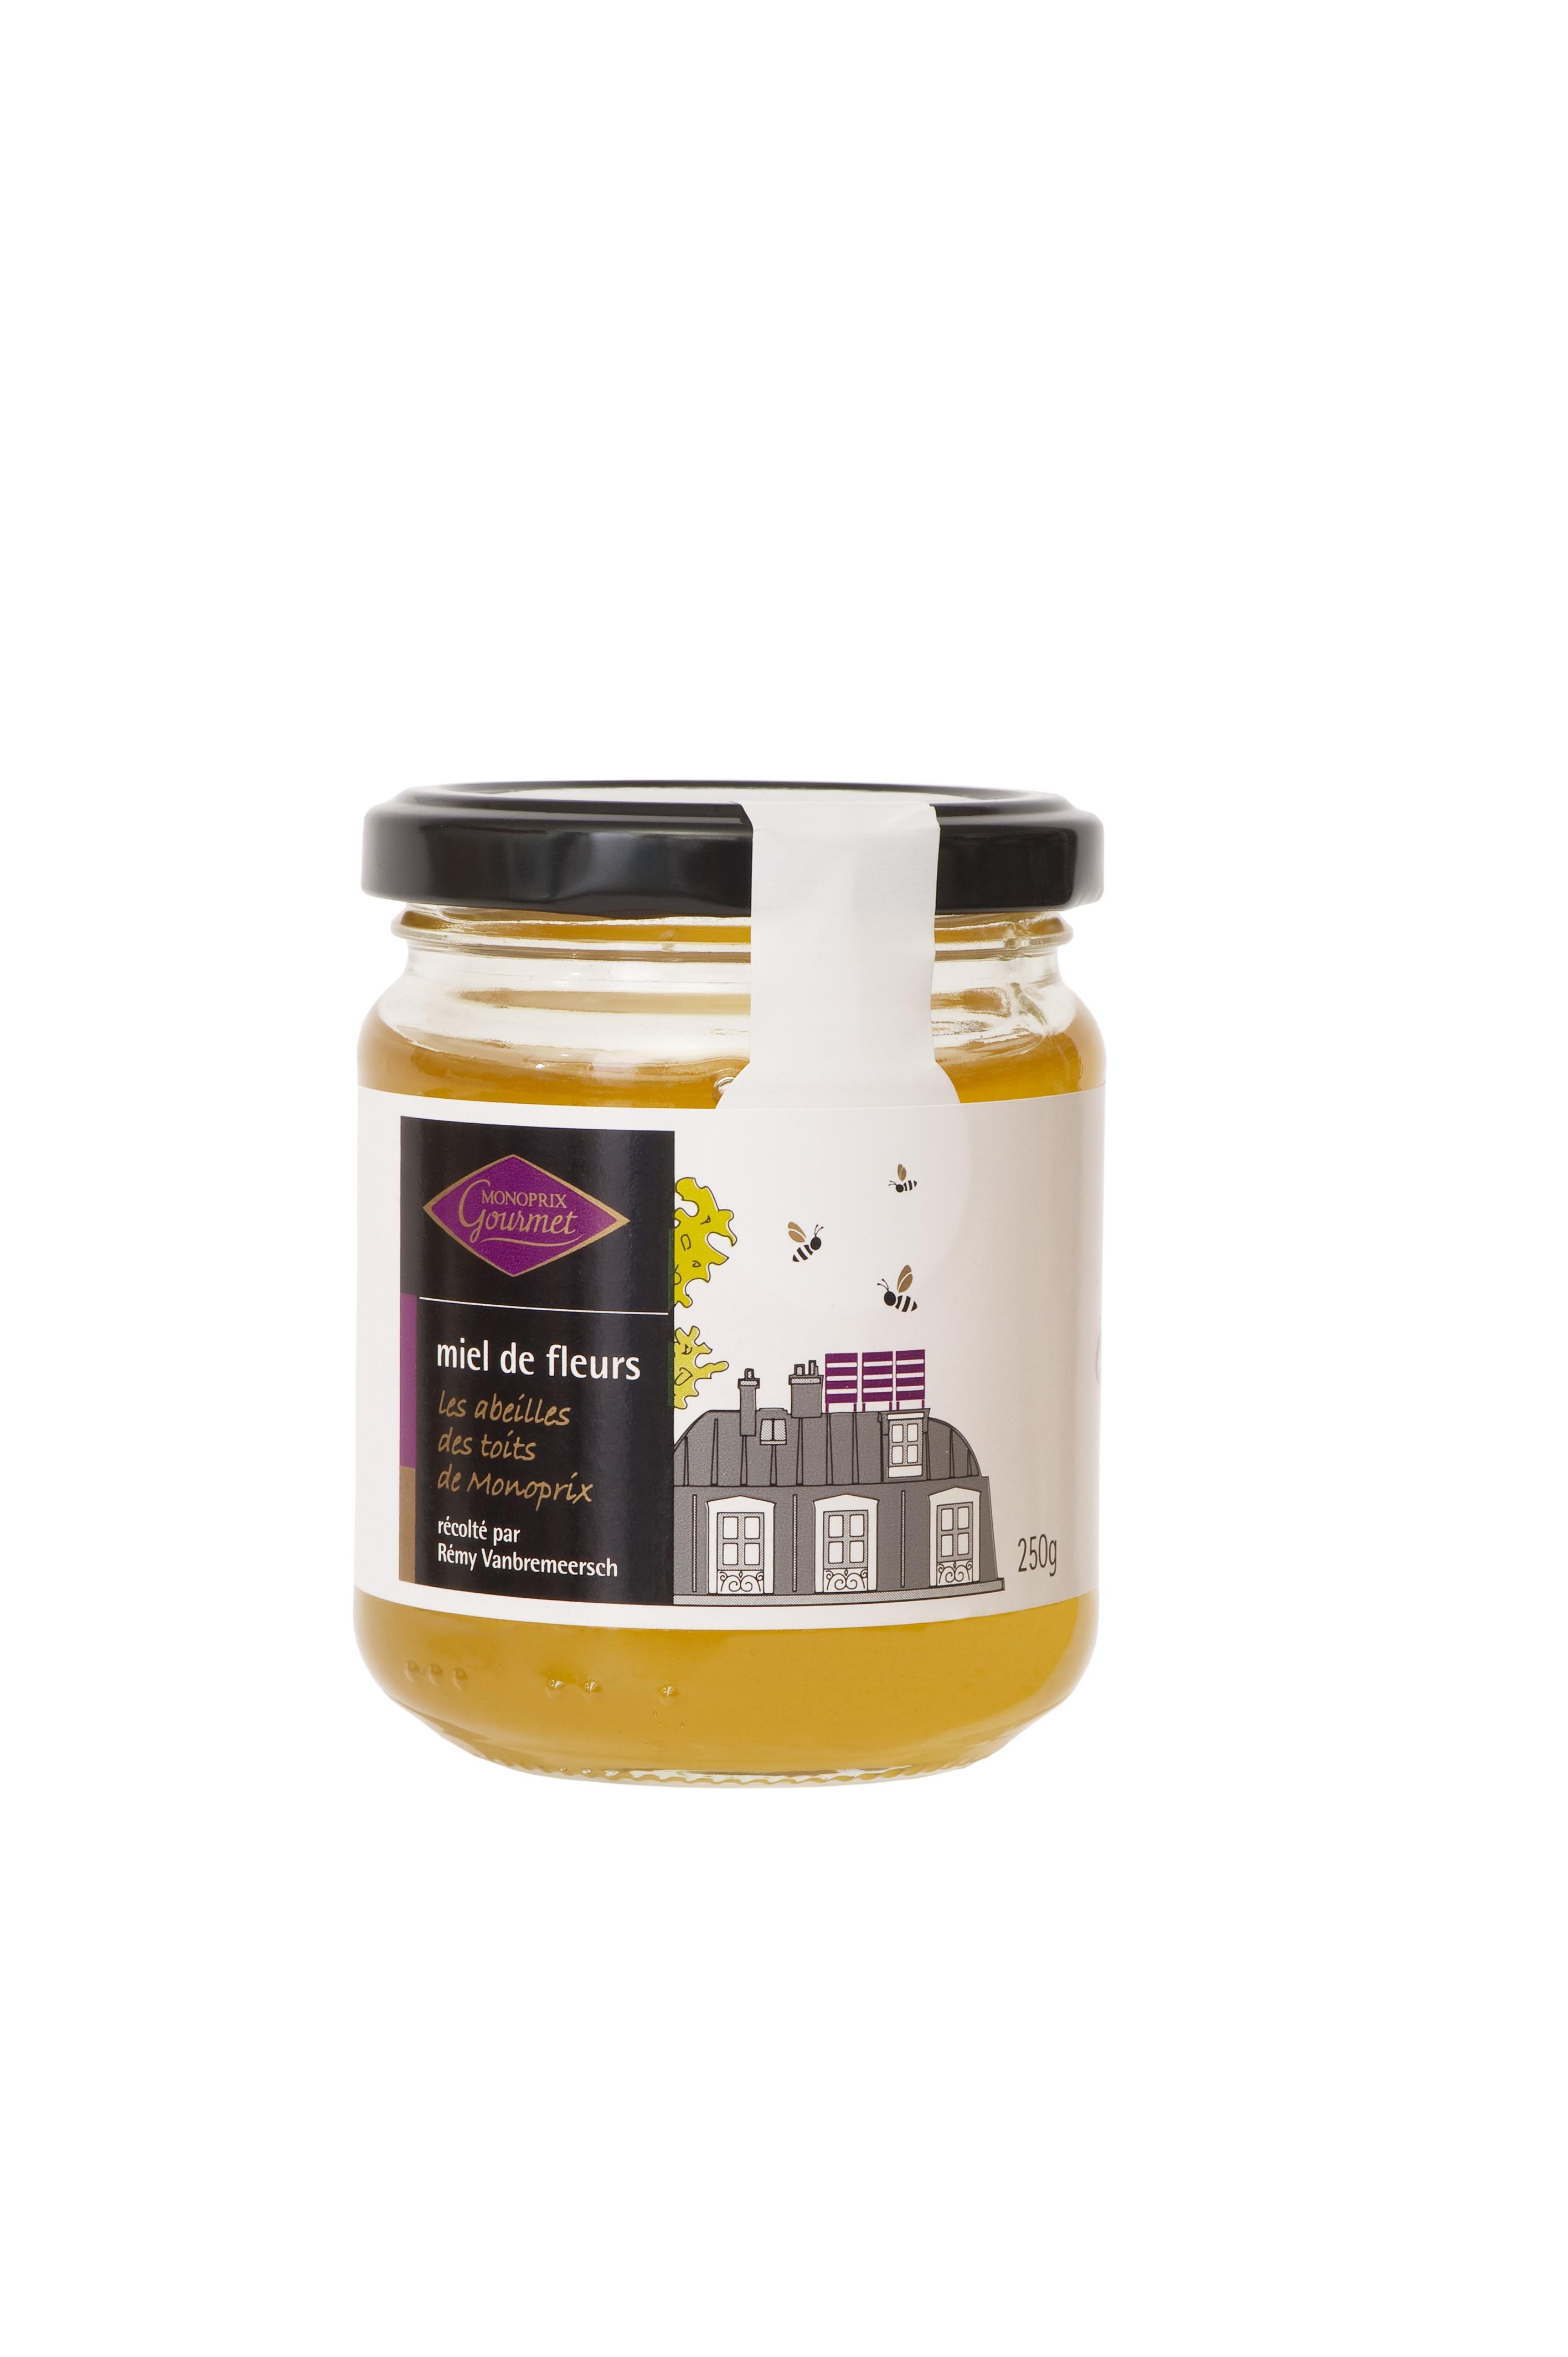 Le miel de la ruche d c t bien dans ma cuisine - La ruche a miel ...